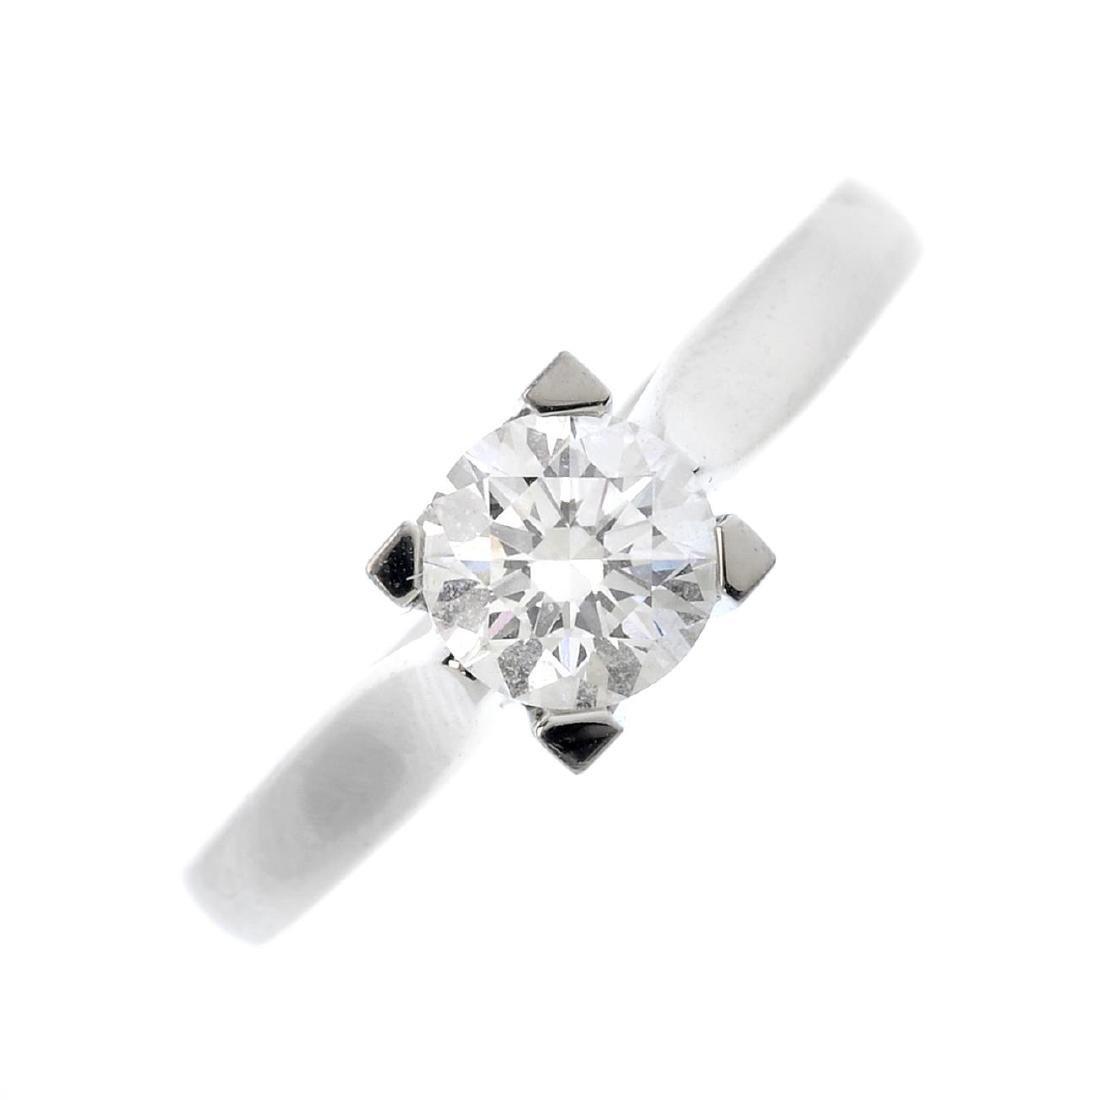 HARRY WINSTON - a diamond single-stone ring. The